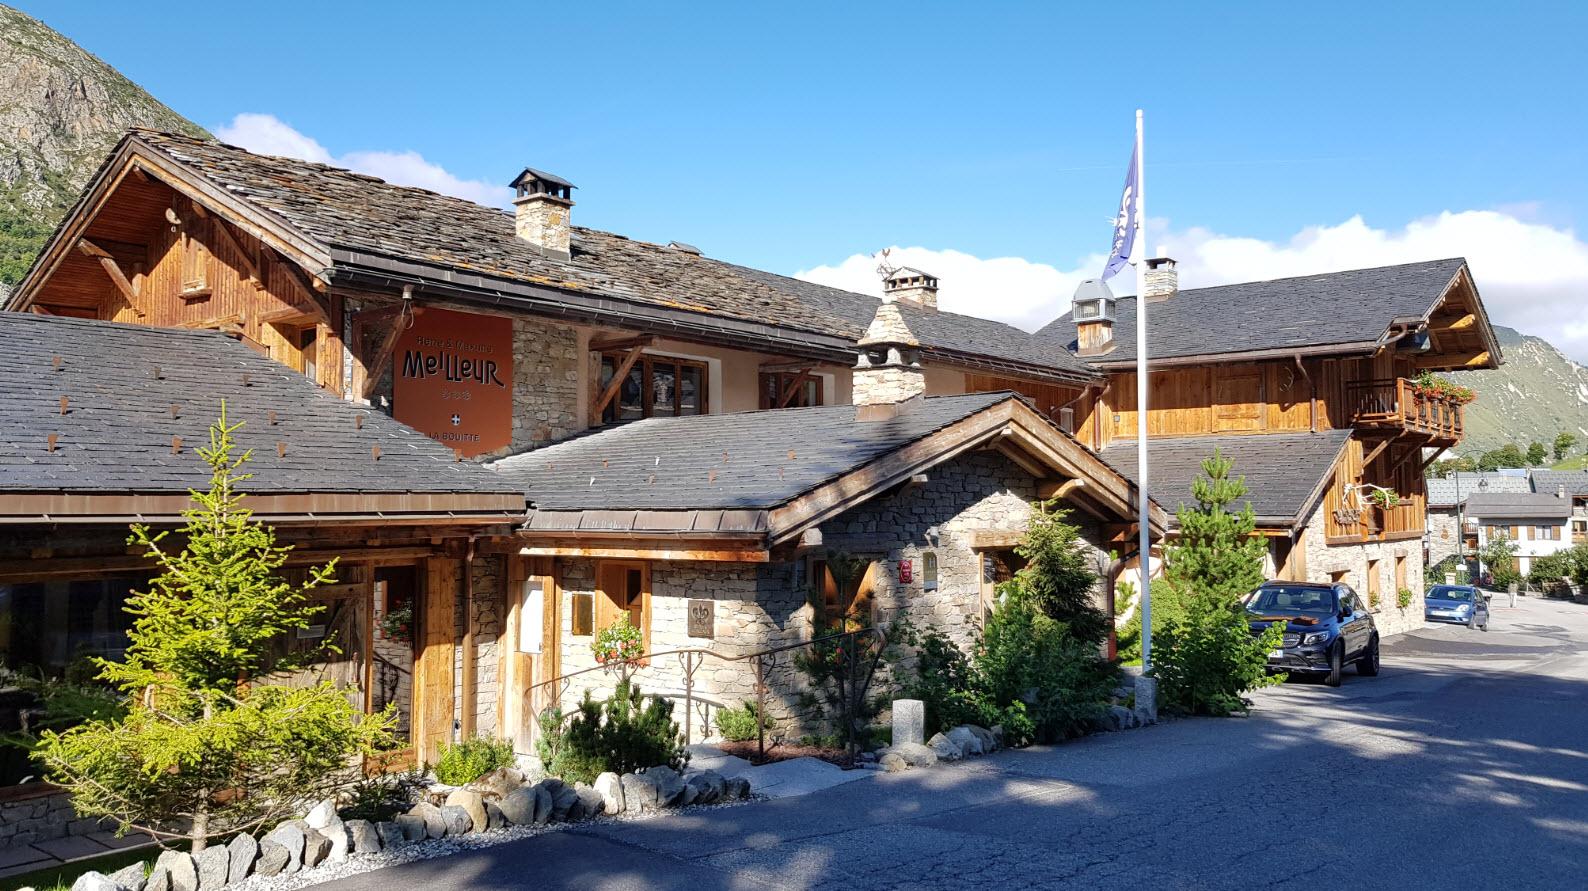 Hotel 5 etoiles domaine skiable 3 Vallee